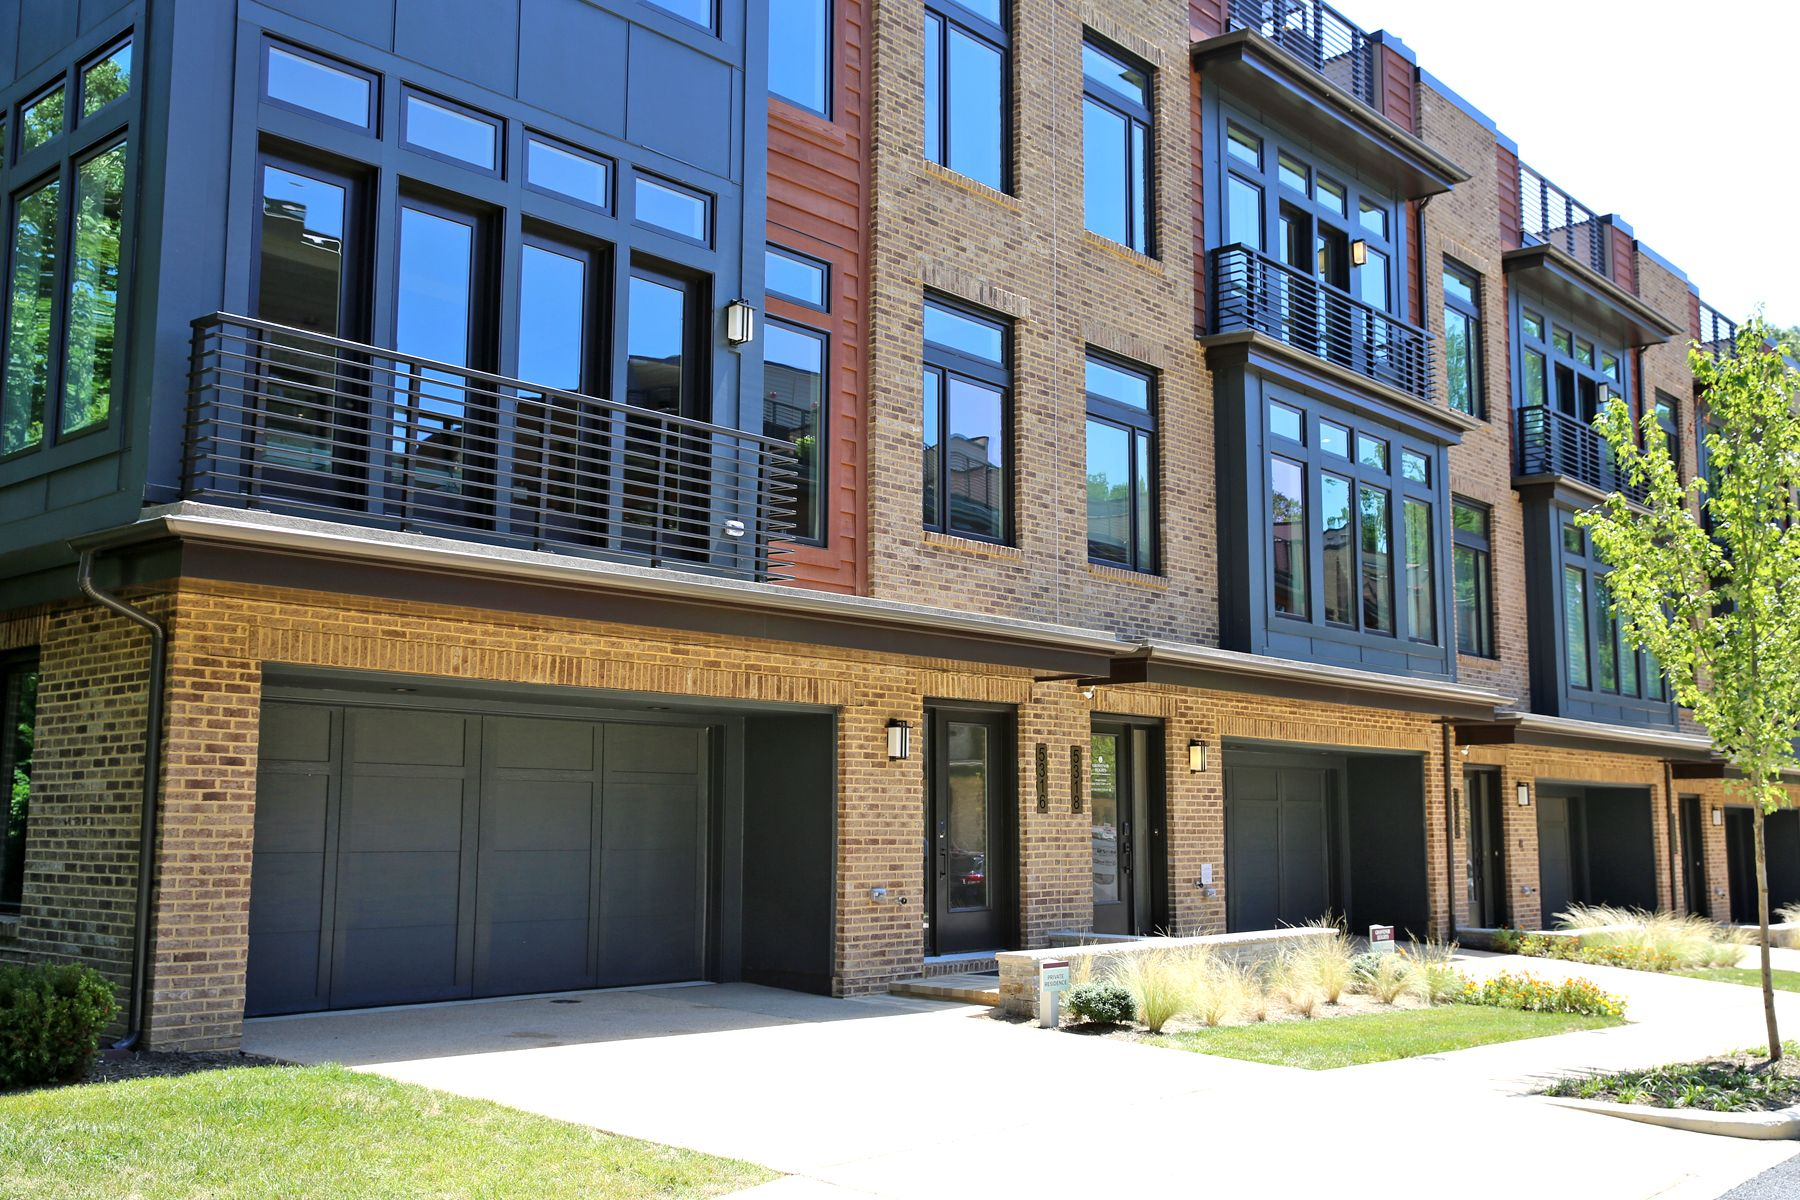 Superbe Overhead Door Company Of Washington, DC™ Is Proud To Provide The Garage  Doors U0026 Openers For The Townhomes In EYAu0027s Development U2013 Grosvenor Heights  In ...